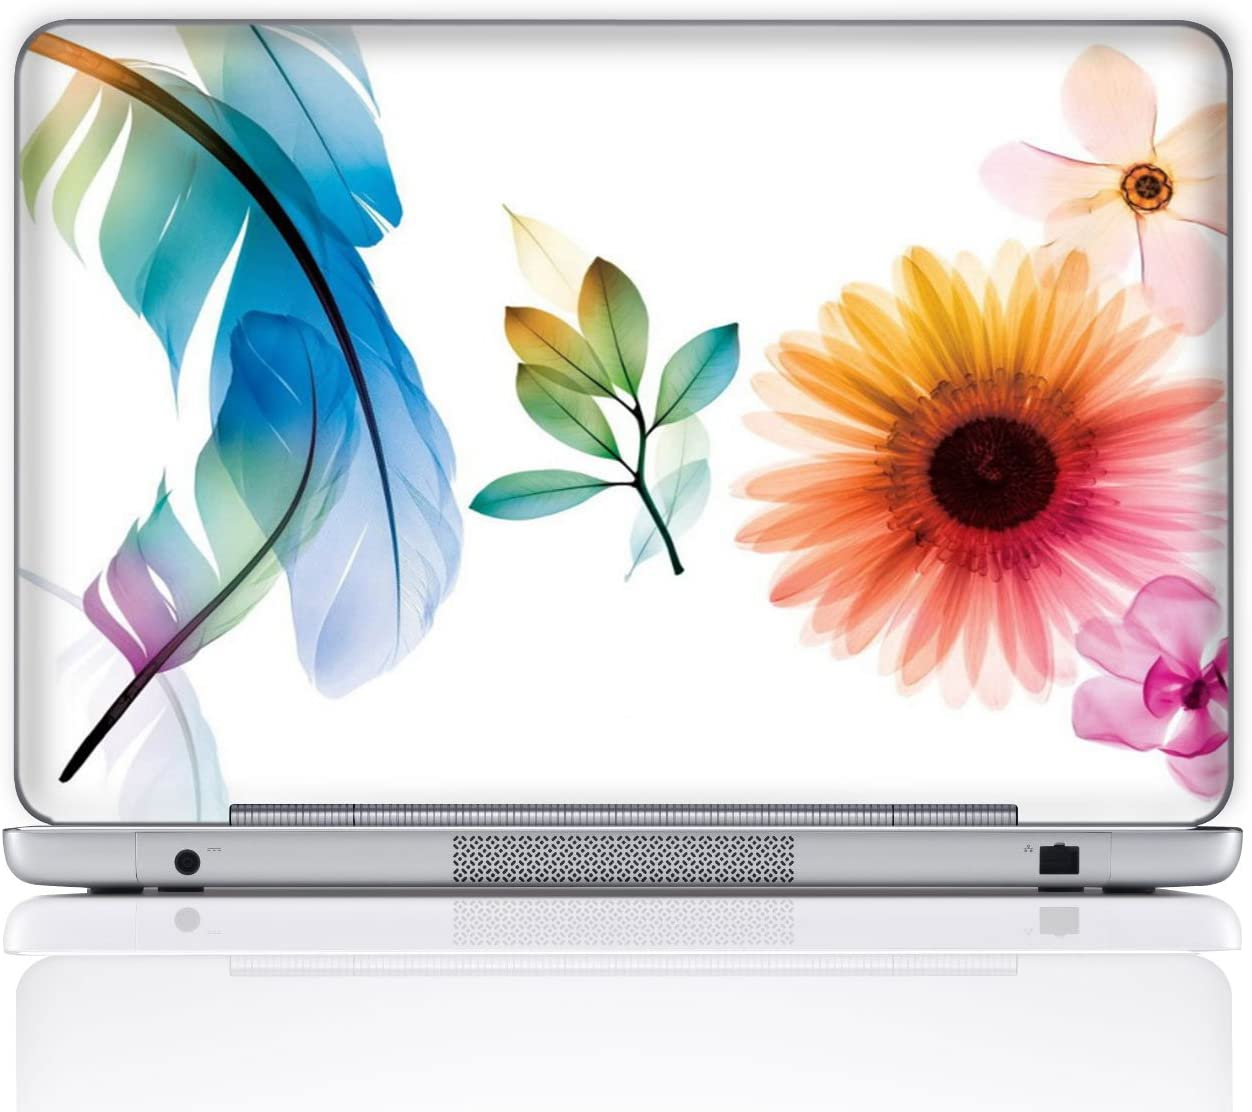 Meffort Inc 13 13.3 Inch Laptop Notebook Skin Sticker Cover Art Decal (Free Wrist pad) - Flower Leave Design